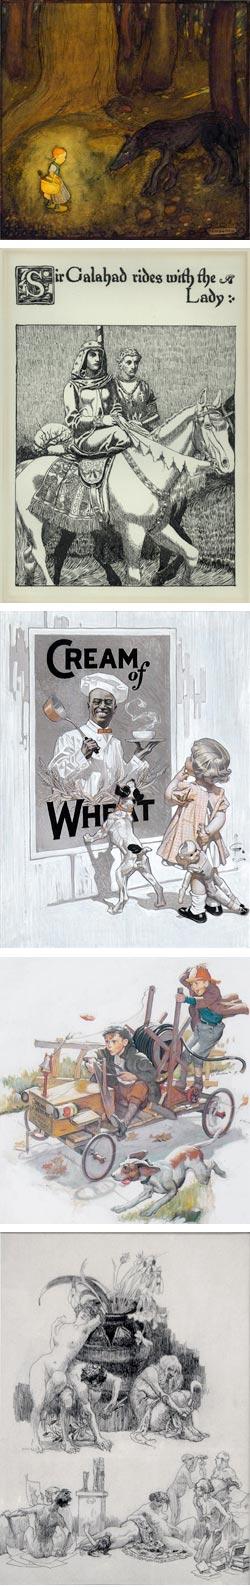 Walt Reed's Illustration House:  Gustaf Tenggren, Howard Pyle, J.C. Leyendecker, Harry Anderson, Heinrich Kley